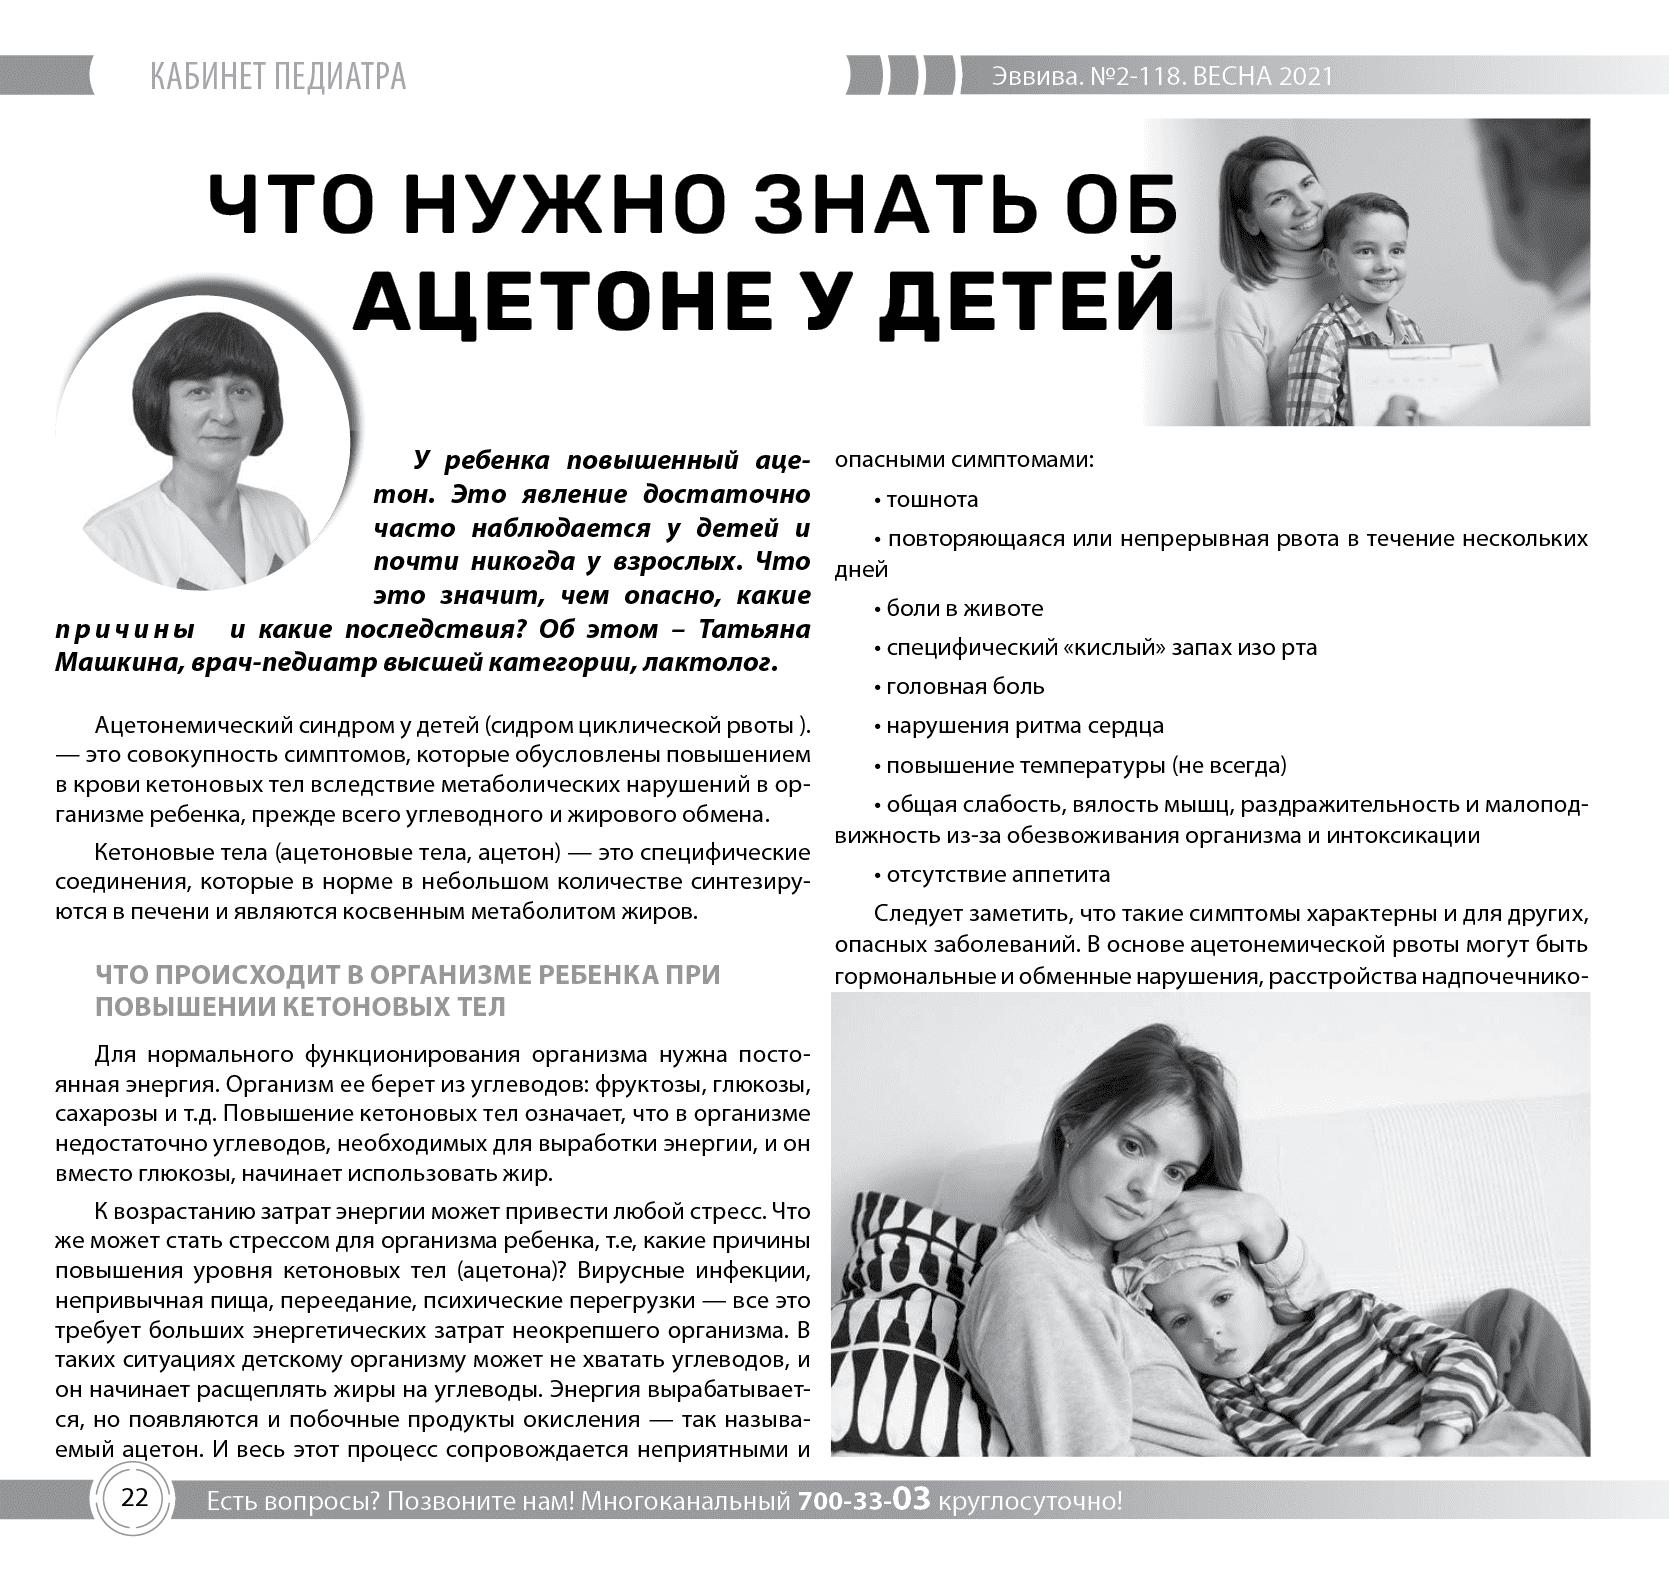 evviva-zhurnal-118-page22